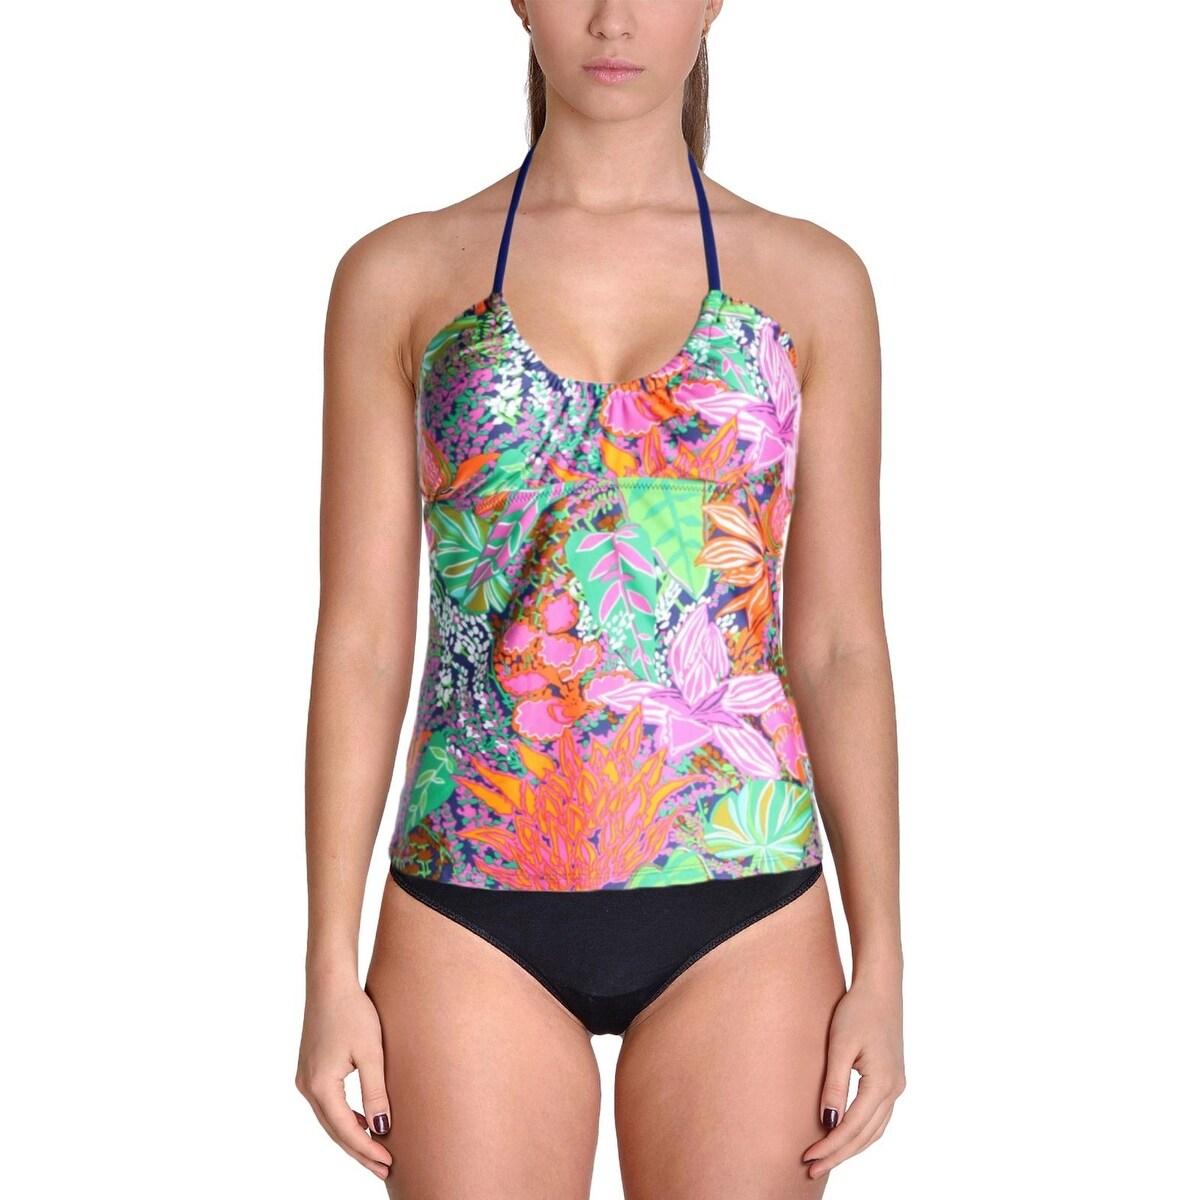 0e0913c1eca Shop Trina Turk Womens Tropical Print Tankini Swim Top Separates - Free  Shipping On Orders Over $45 - Overstock.com - 22201232